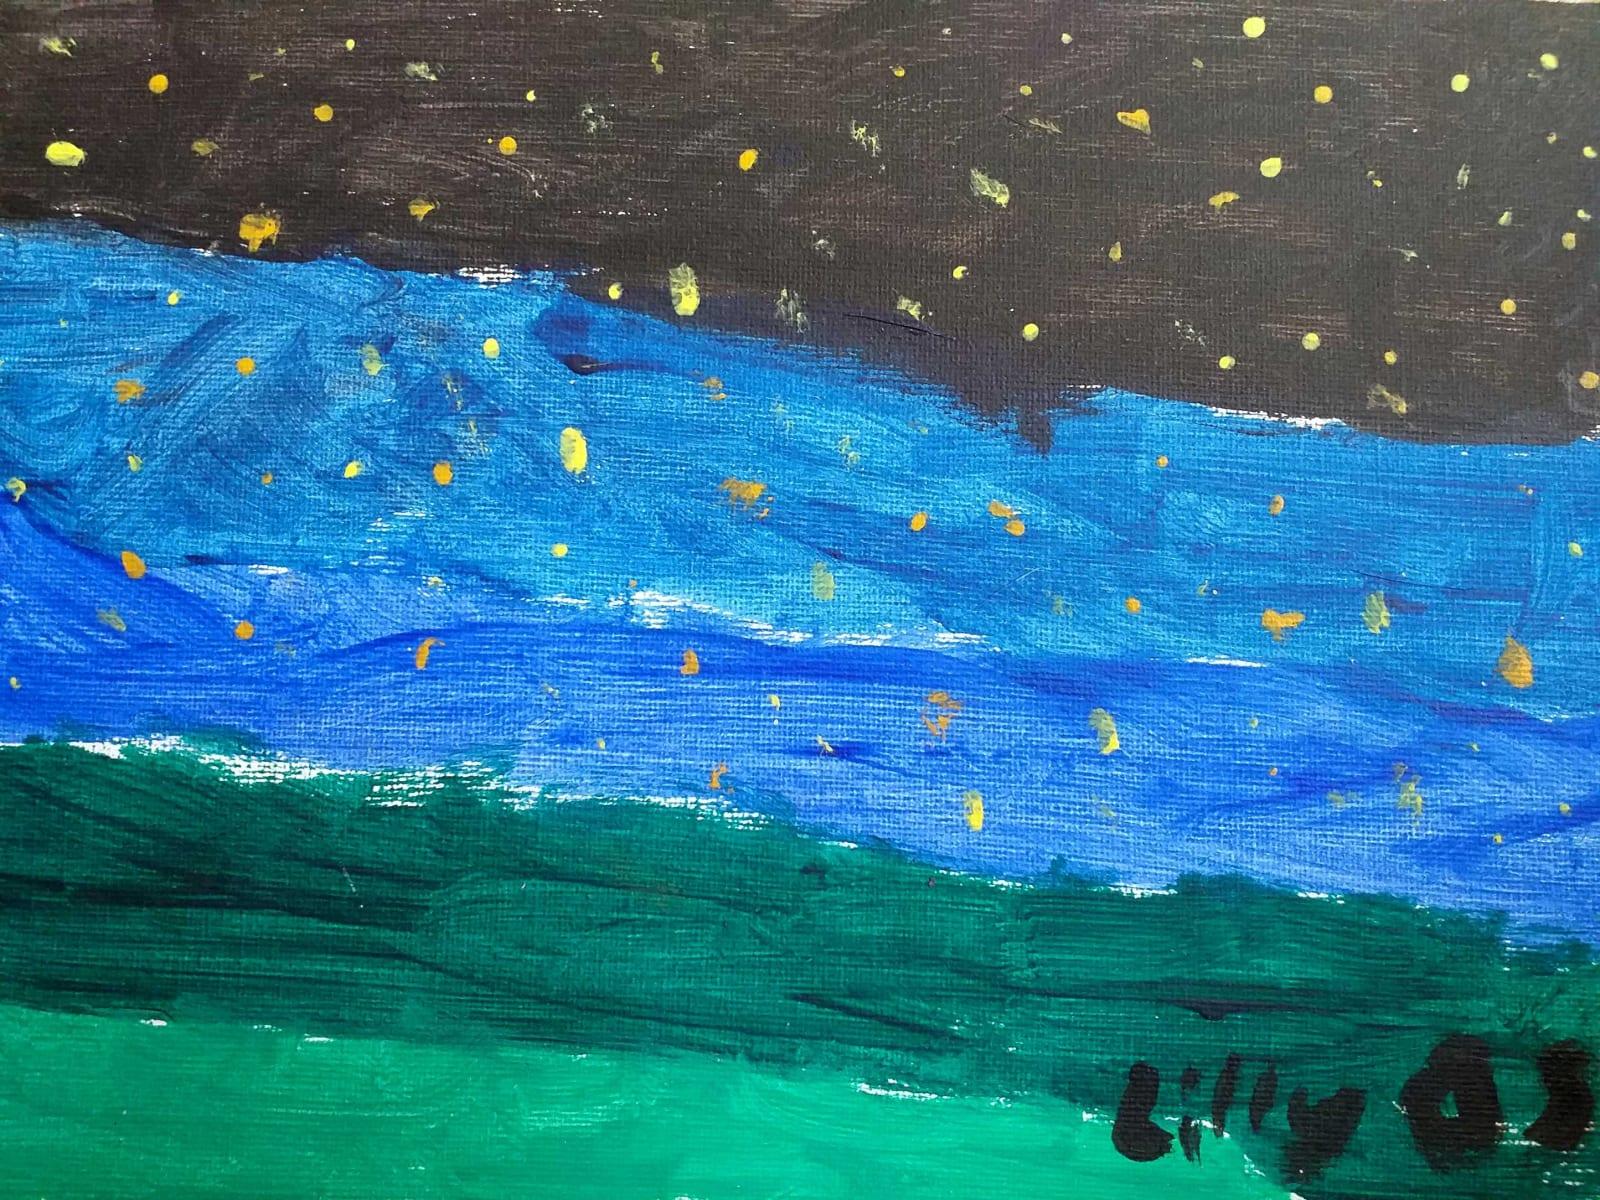 Miss Lilyanna O'Sullivan, Age 8, Untitled